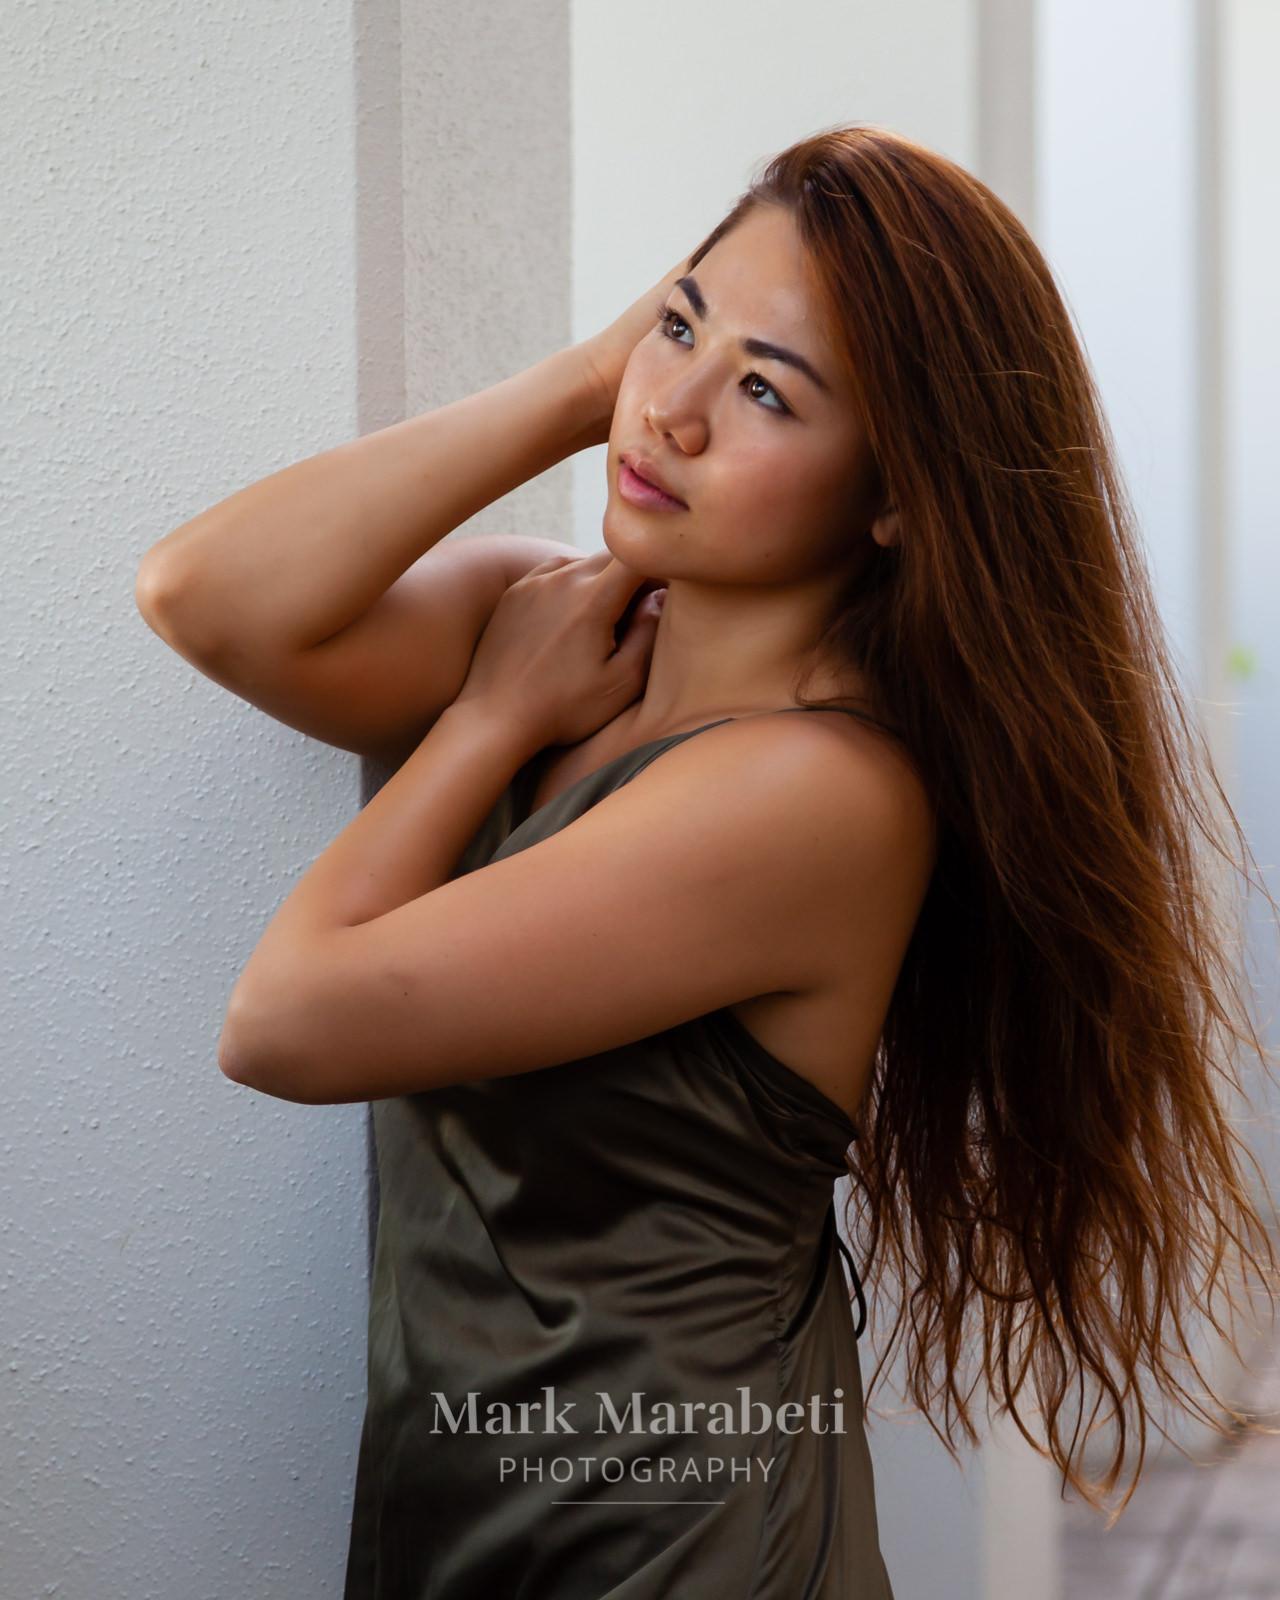 Mark Marabeti Photography-8291.jpg